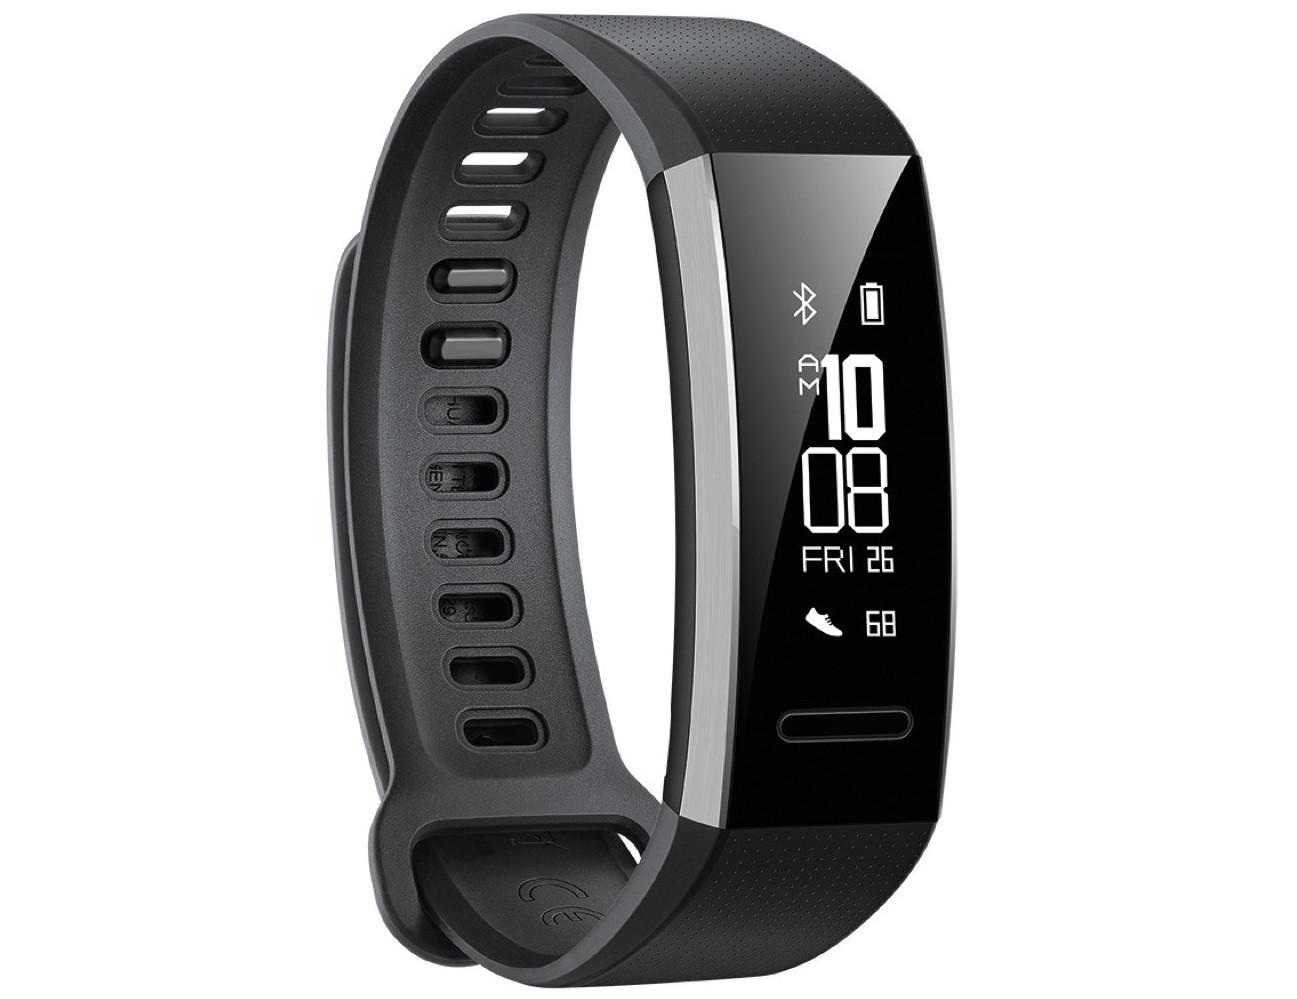 Huawei Band 2 Pro Smartband Review Reviews M2 Bluetooth Smart Bracelet Mi Look Heart Rate Monitor Wristband Fitness Tracker